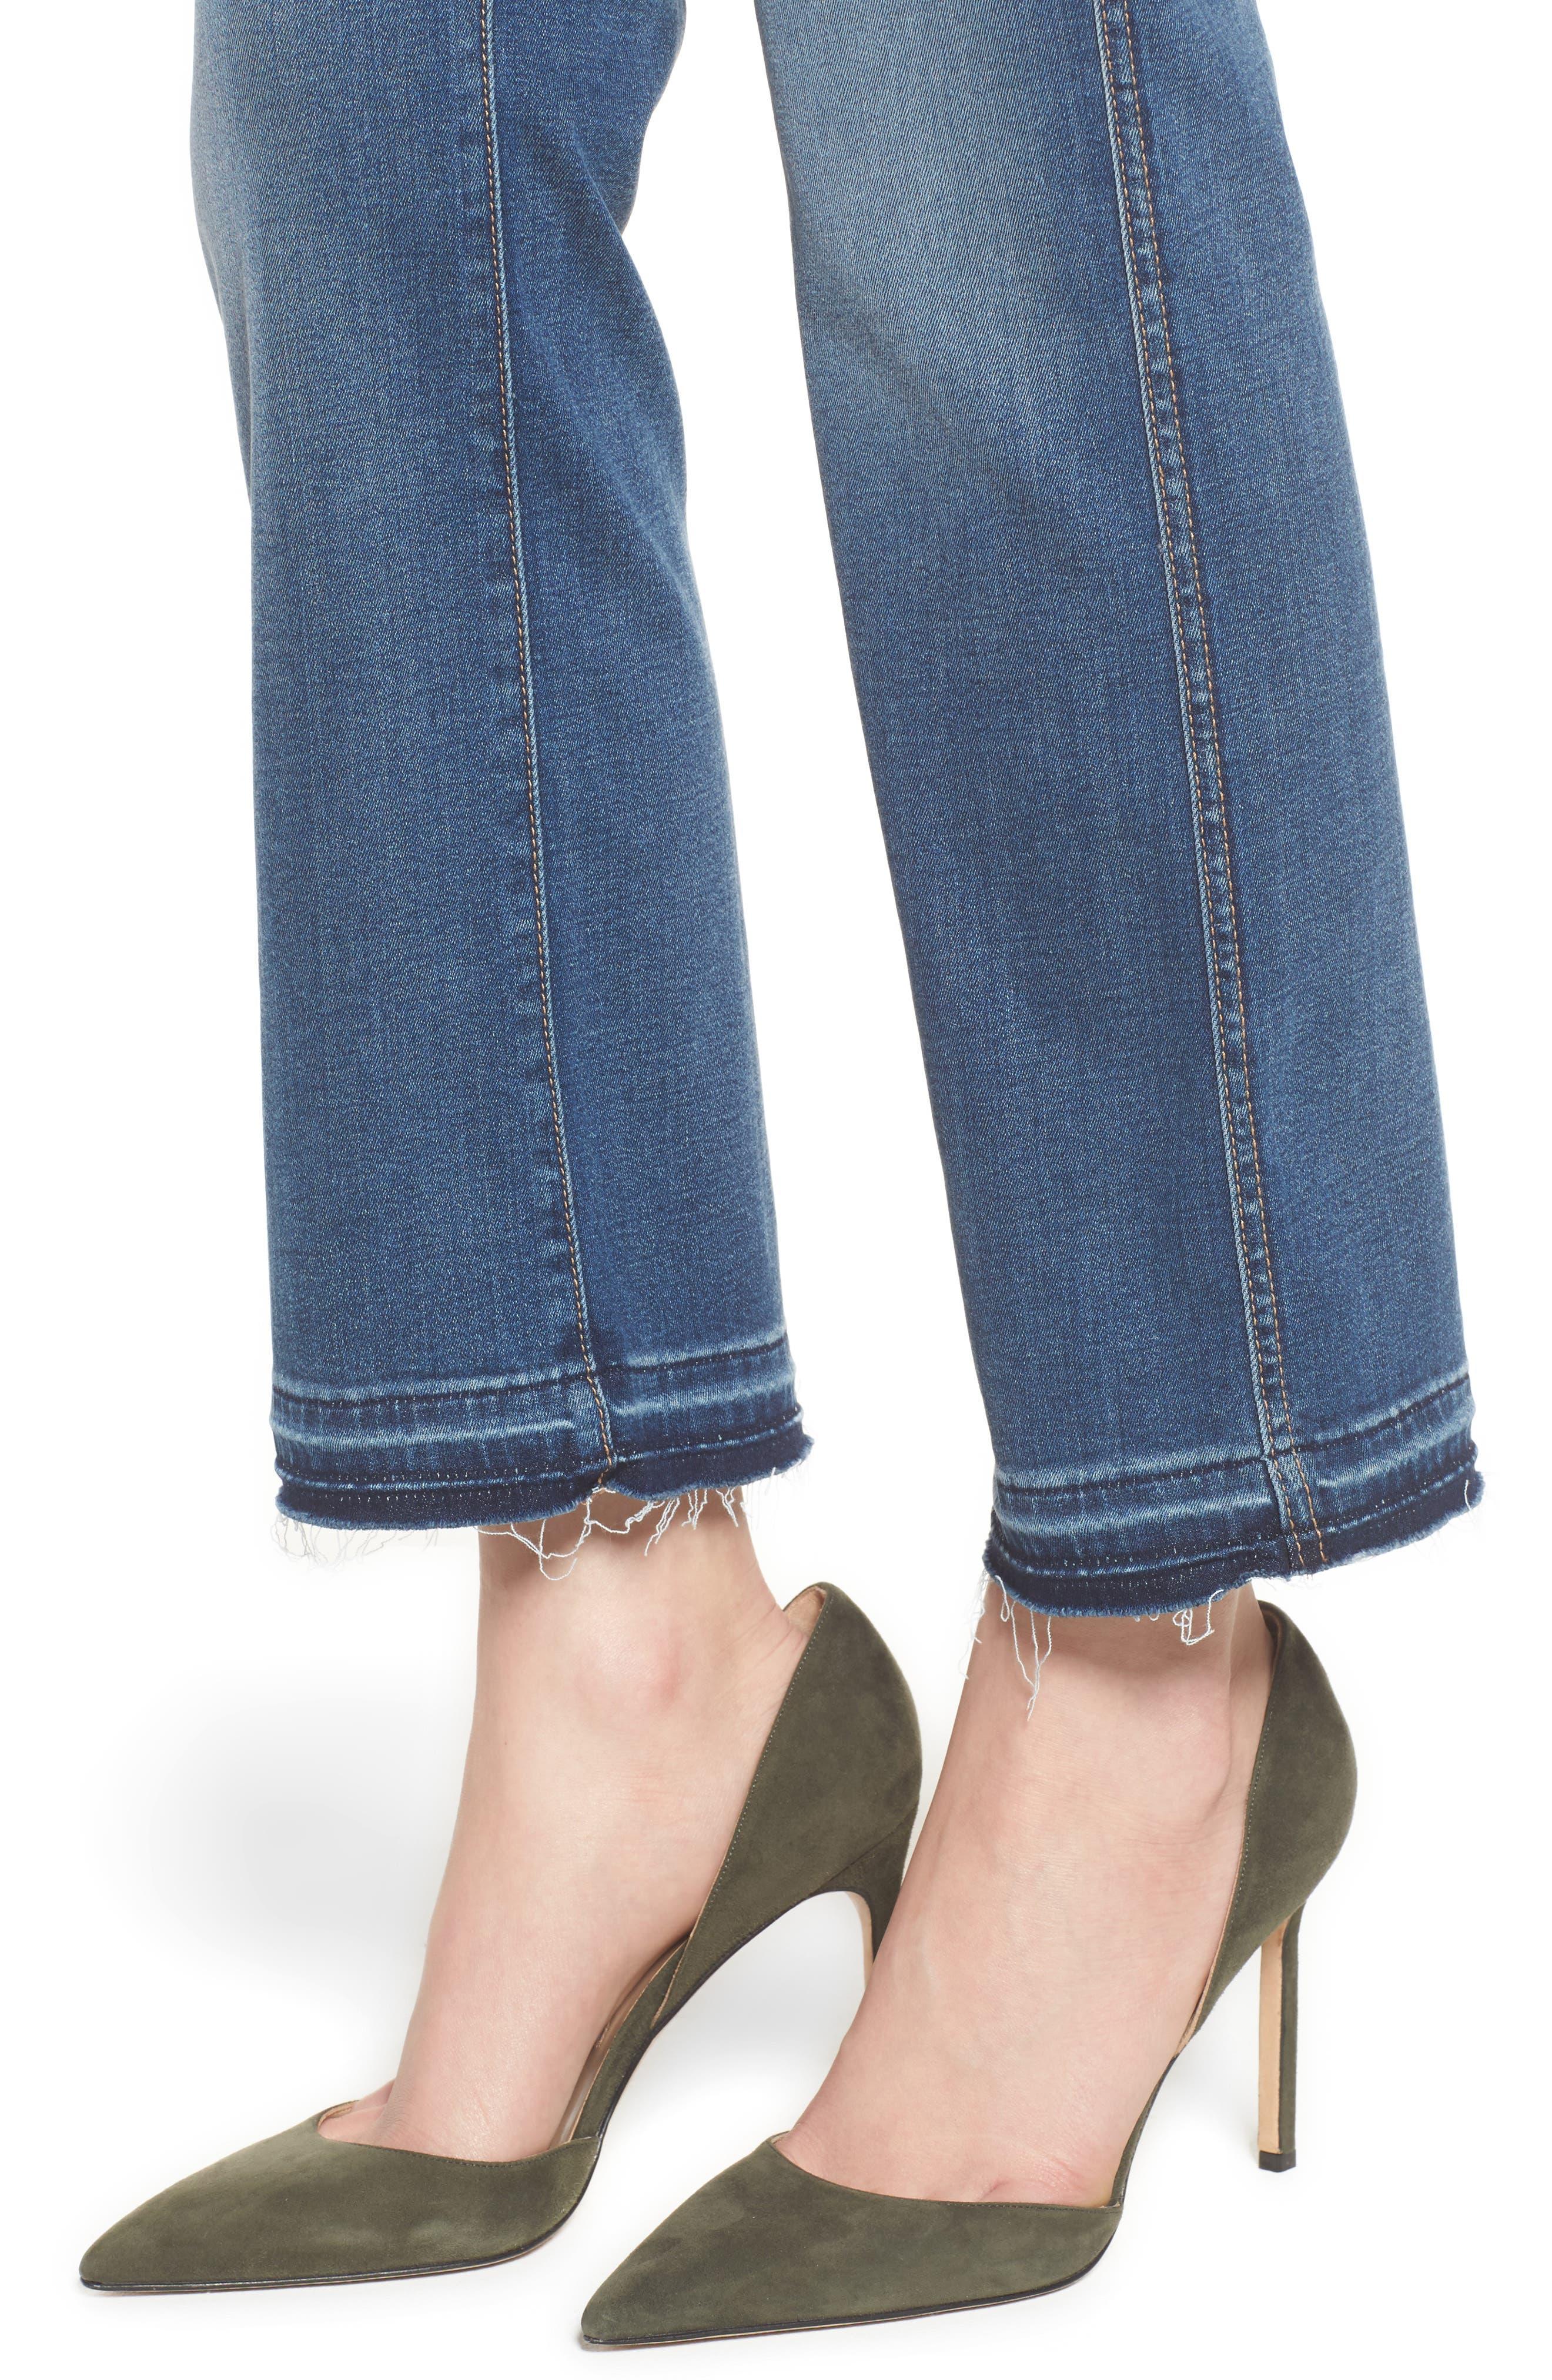 b(air) Crop Bootcut Jeans,                             Alternate thumbnail 4, color,                             Bair Vintage Dusk